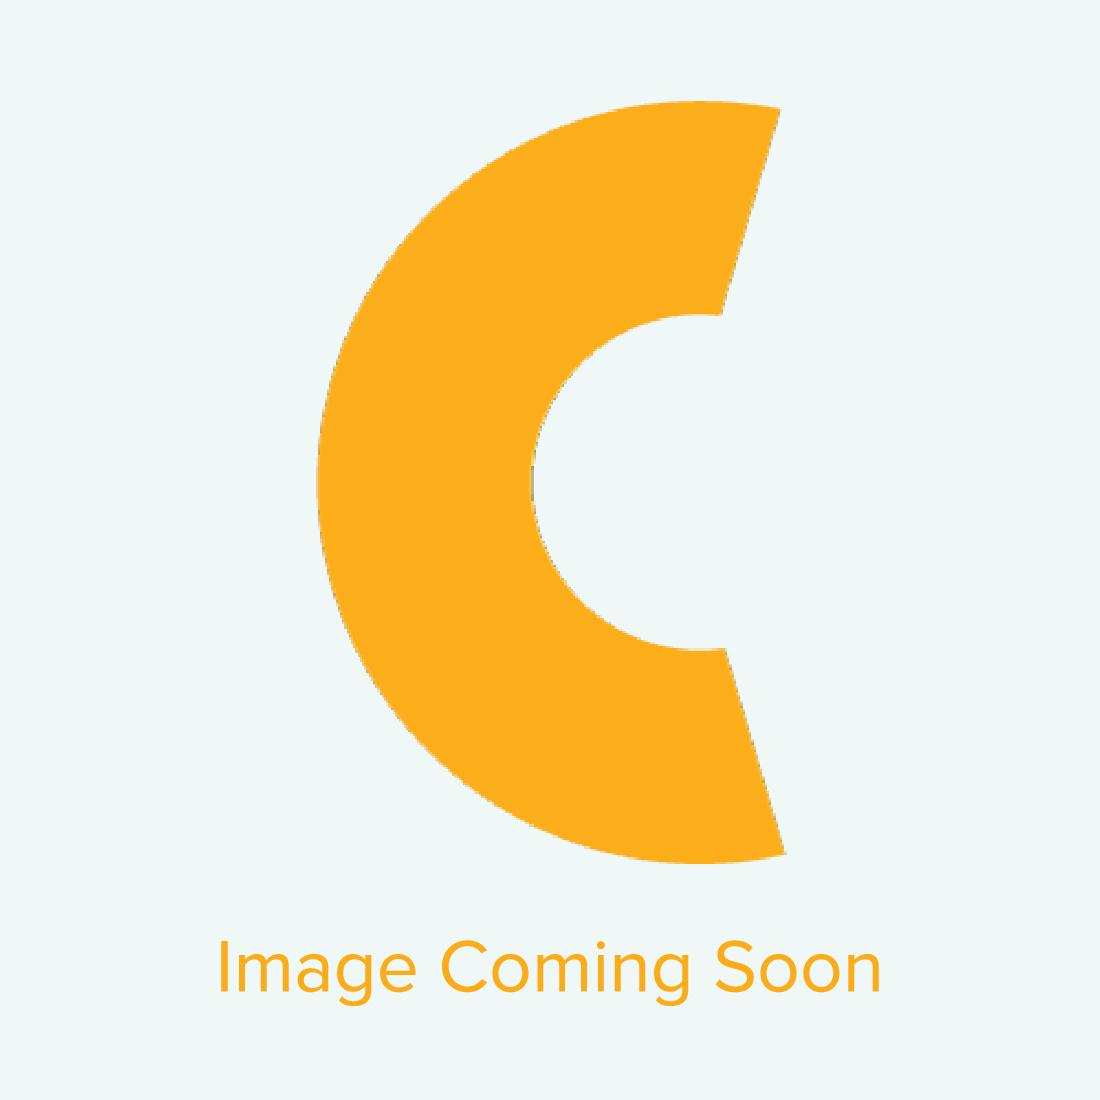 "Xpress Cut Heat Transfer Vinyl - 15"" x 50 yards"